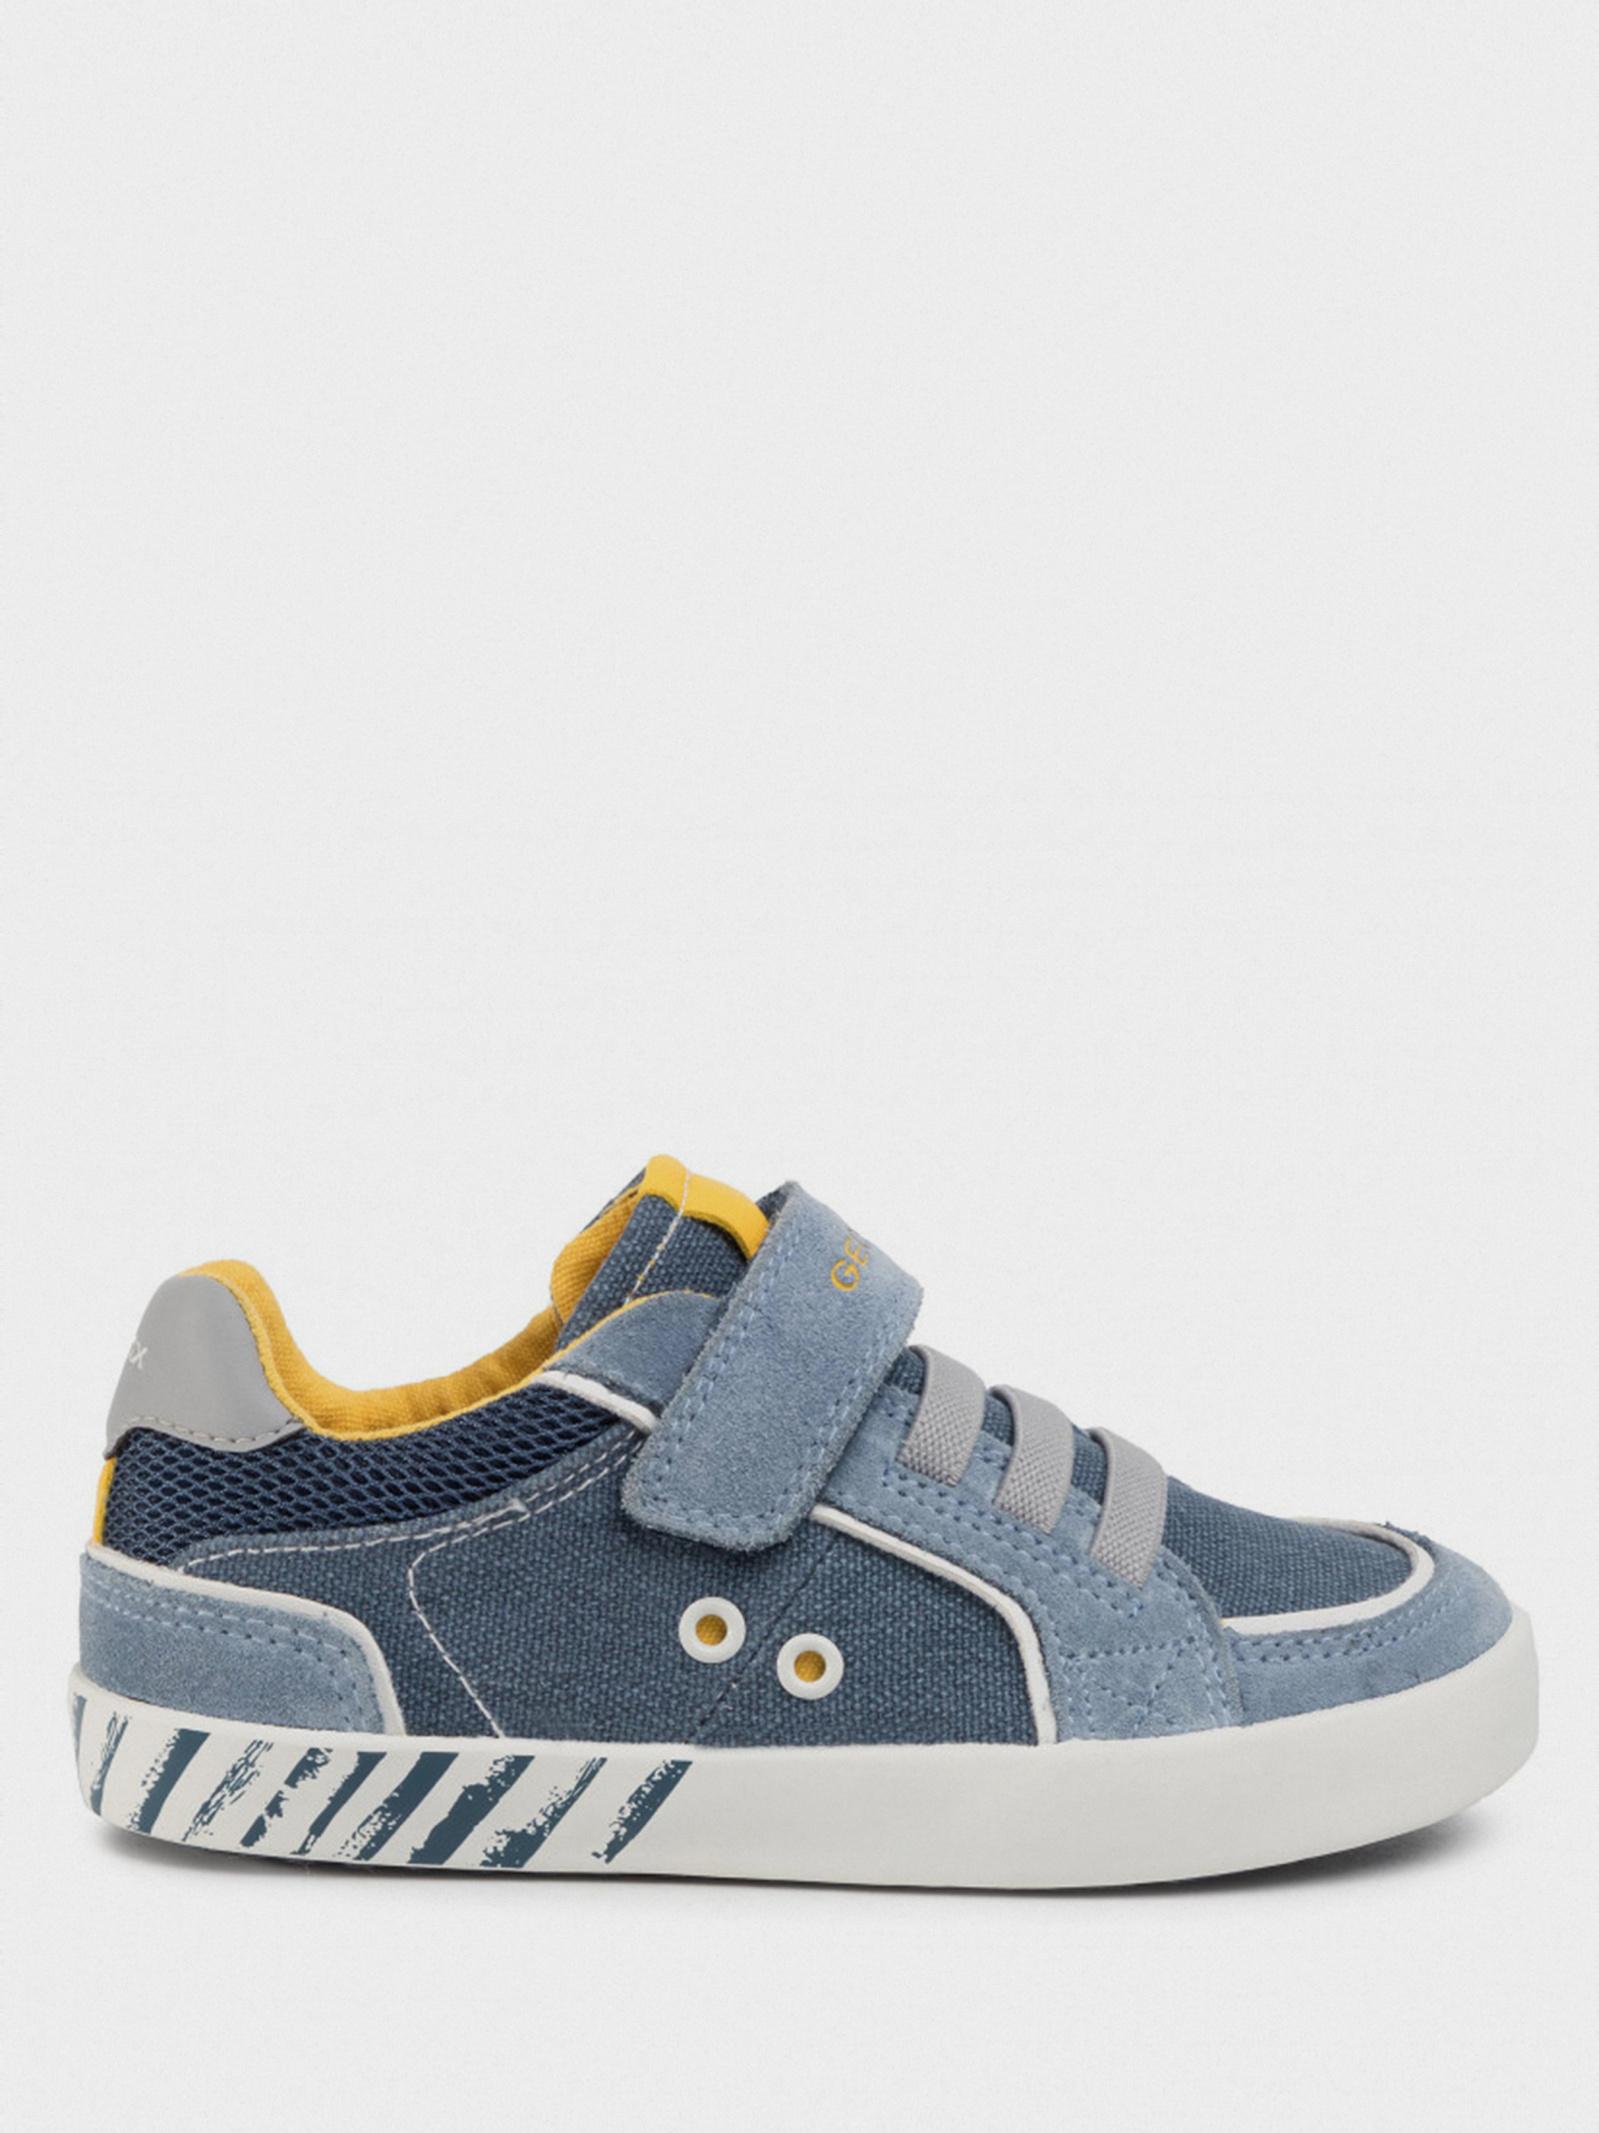 Полуботинки детские Geox B KILWI BOY B02A7B-0NB22-C4B4S модная обувь, 2017